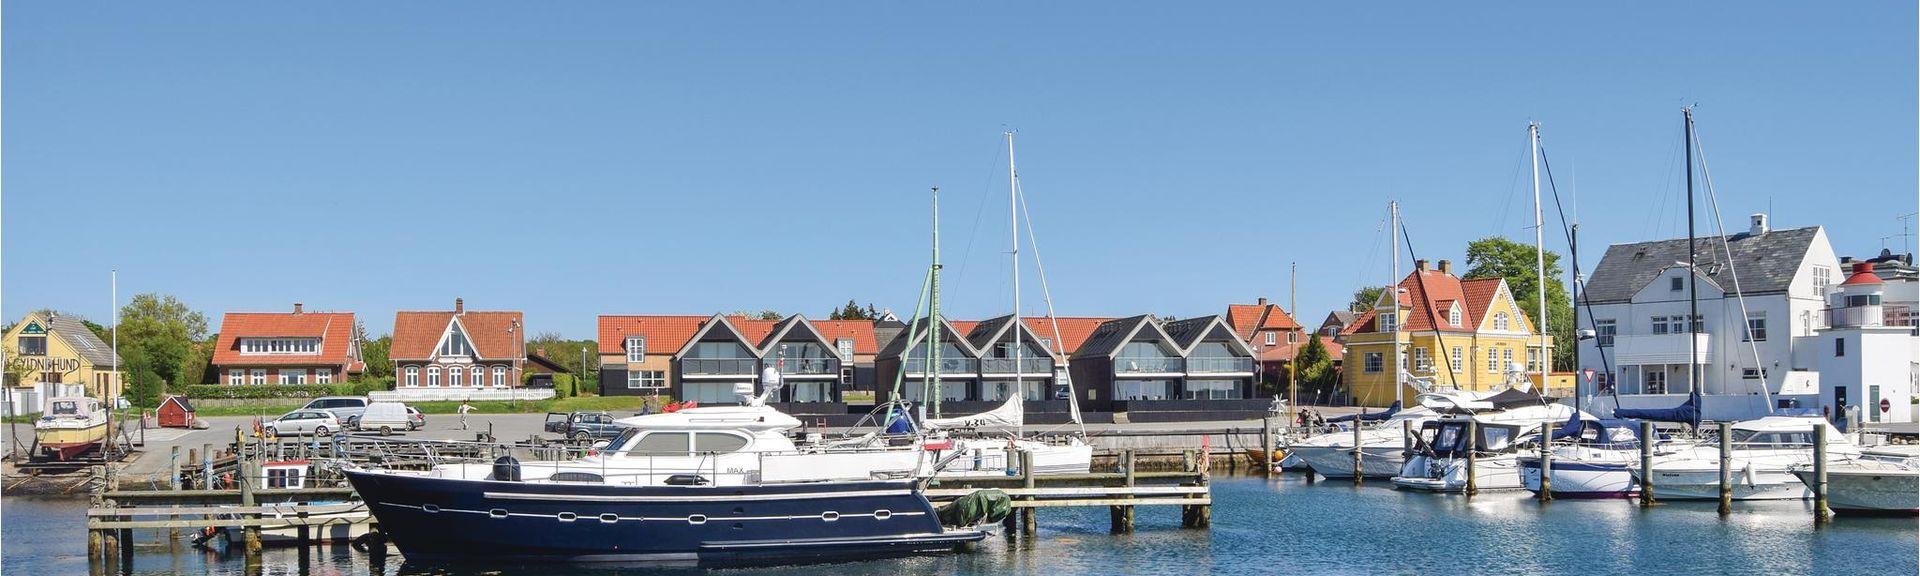 Langeland, Danmark